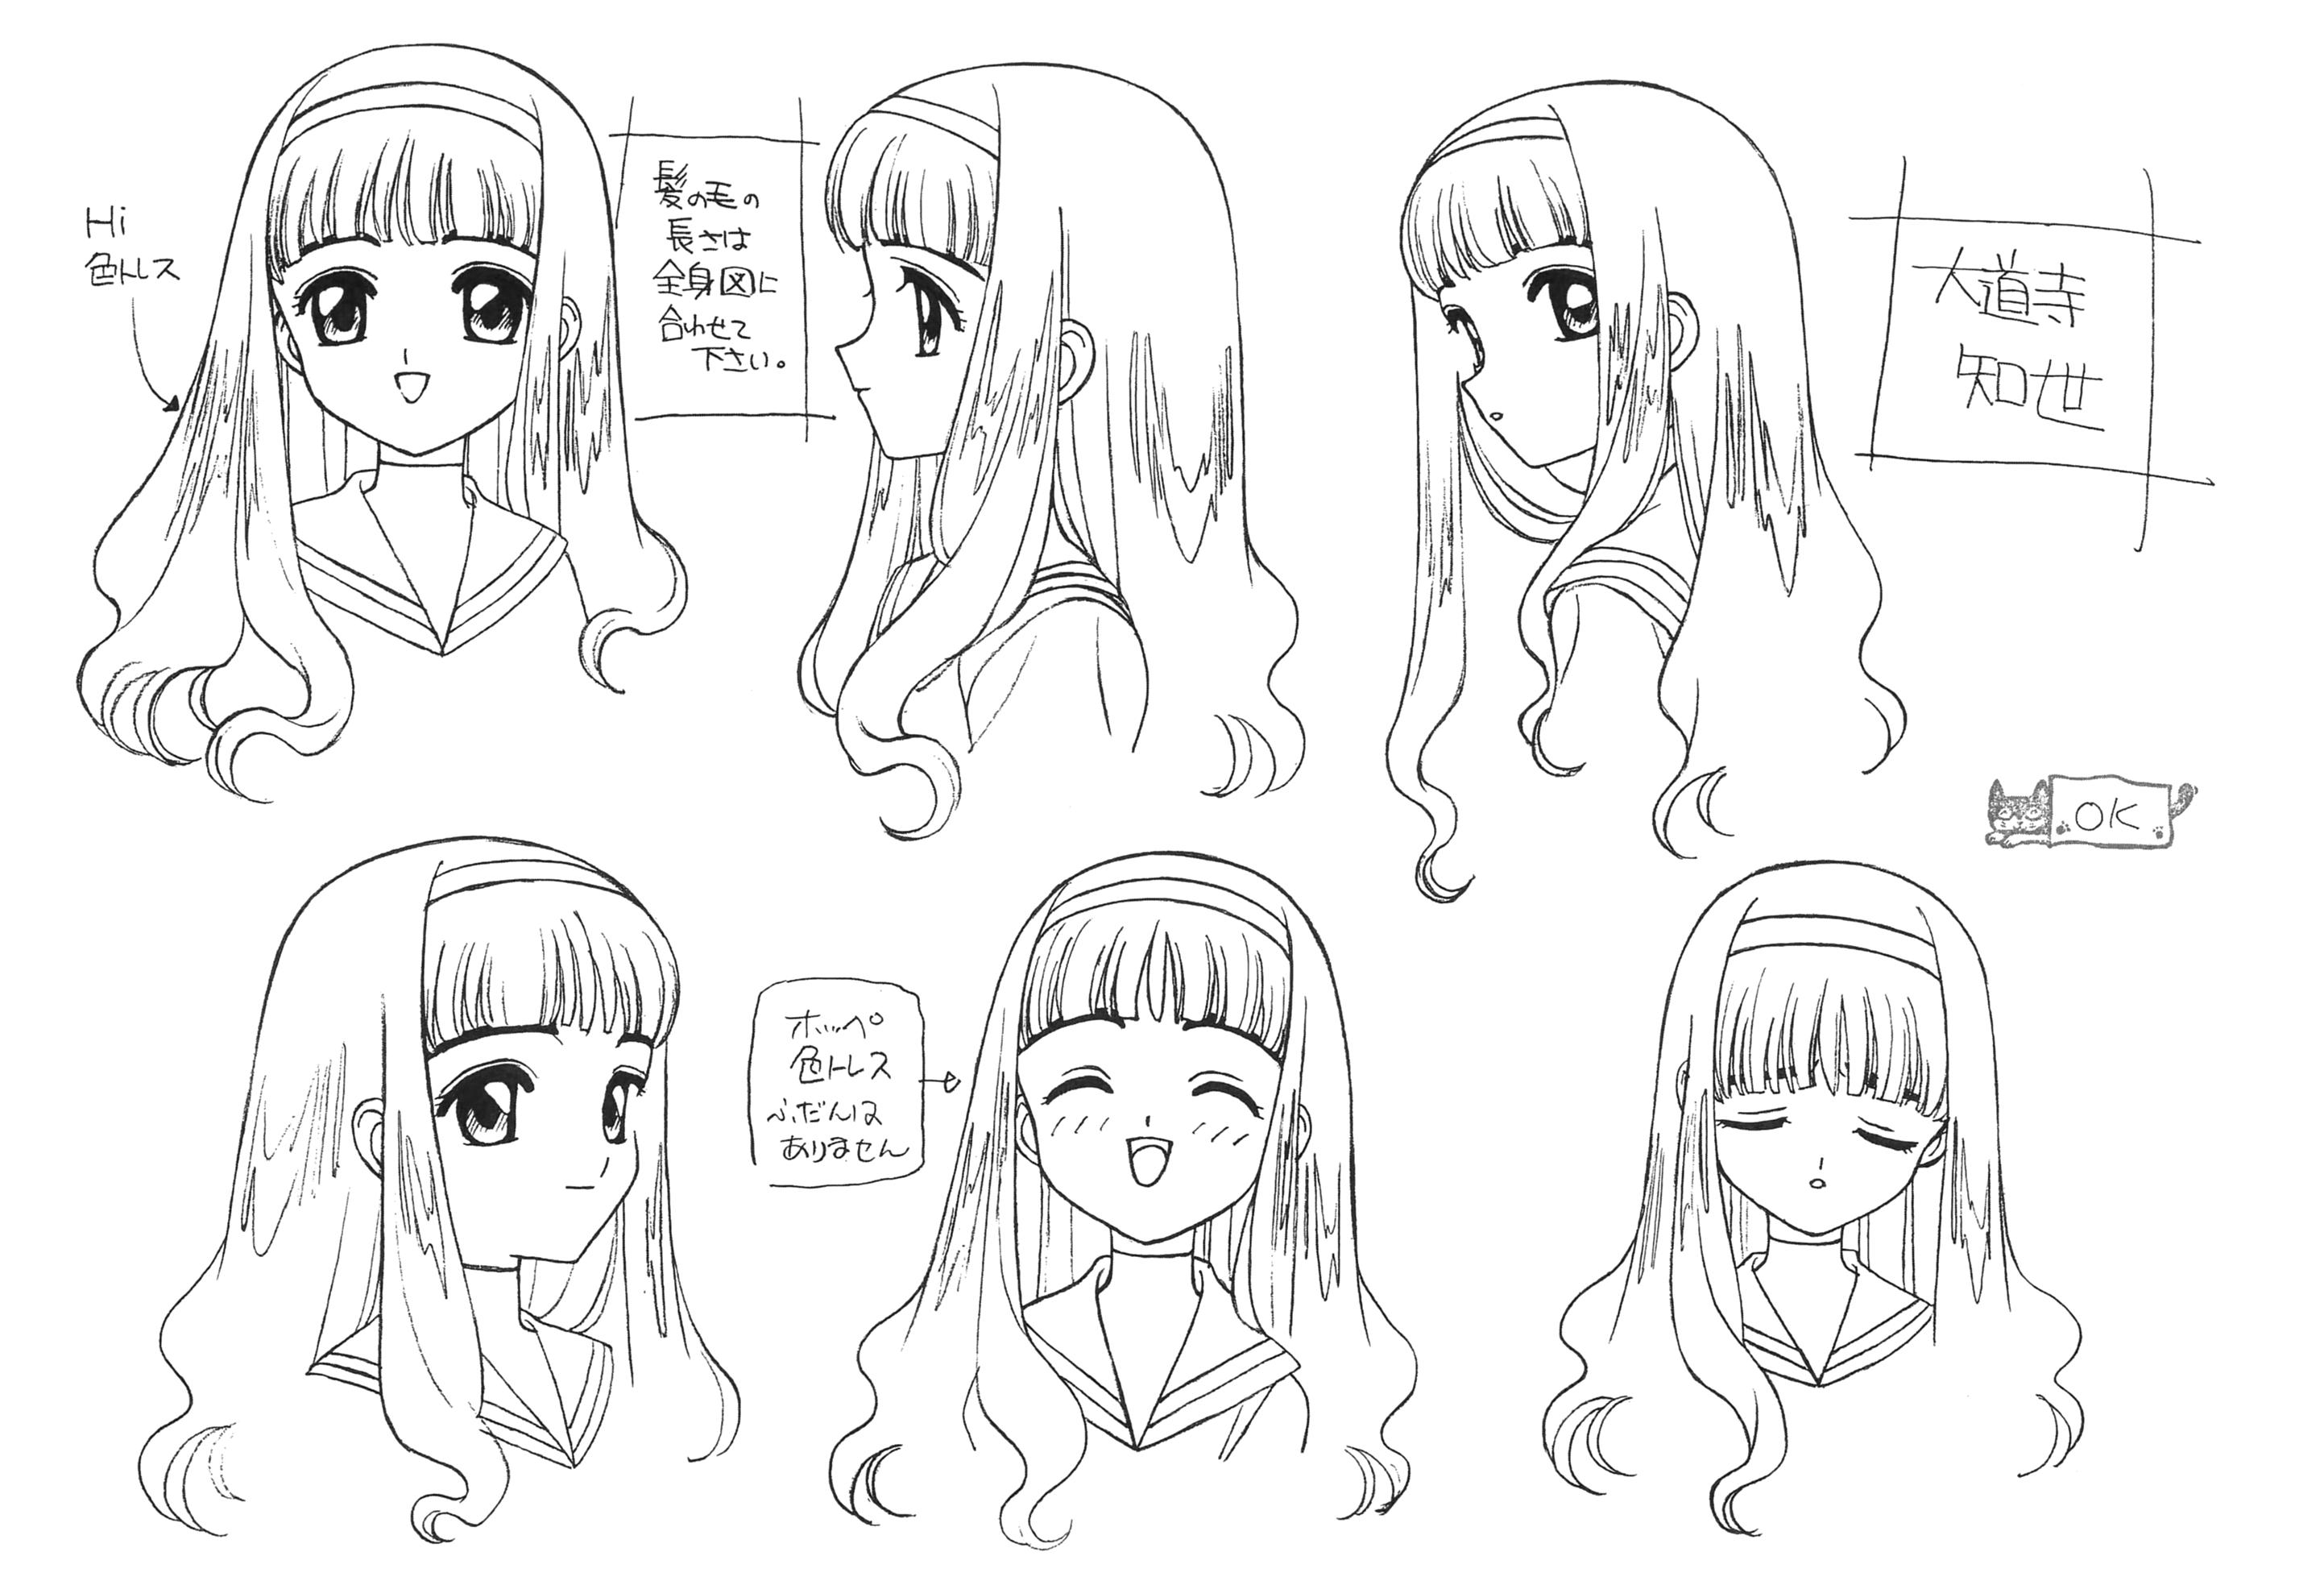 Cardcaptor Sakura Animated Works Special Edition